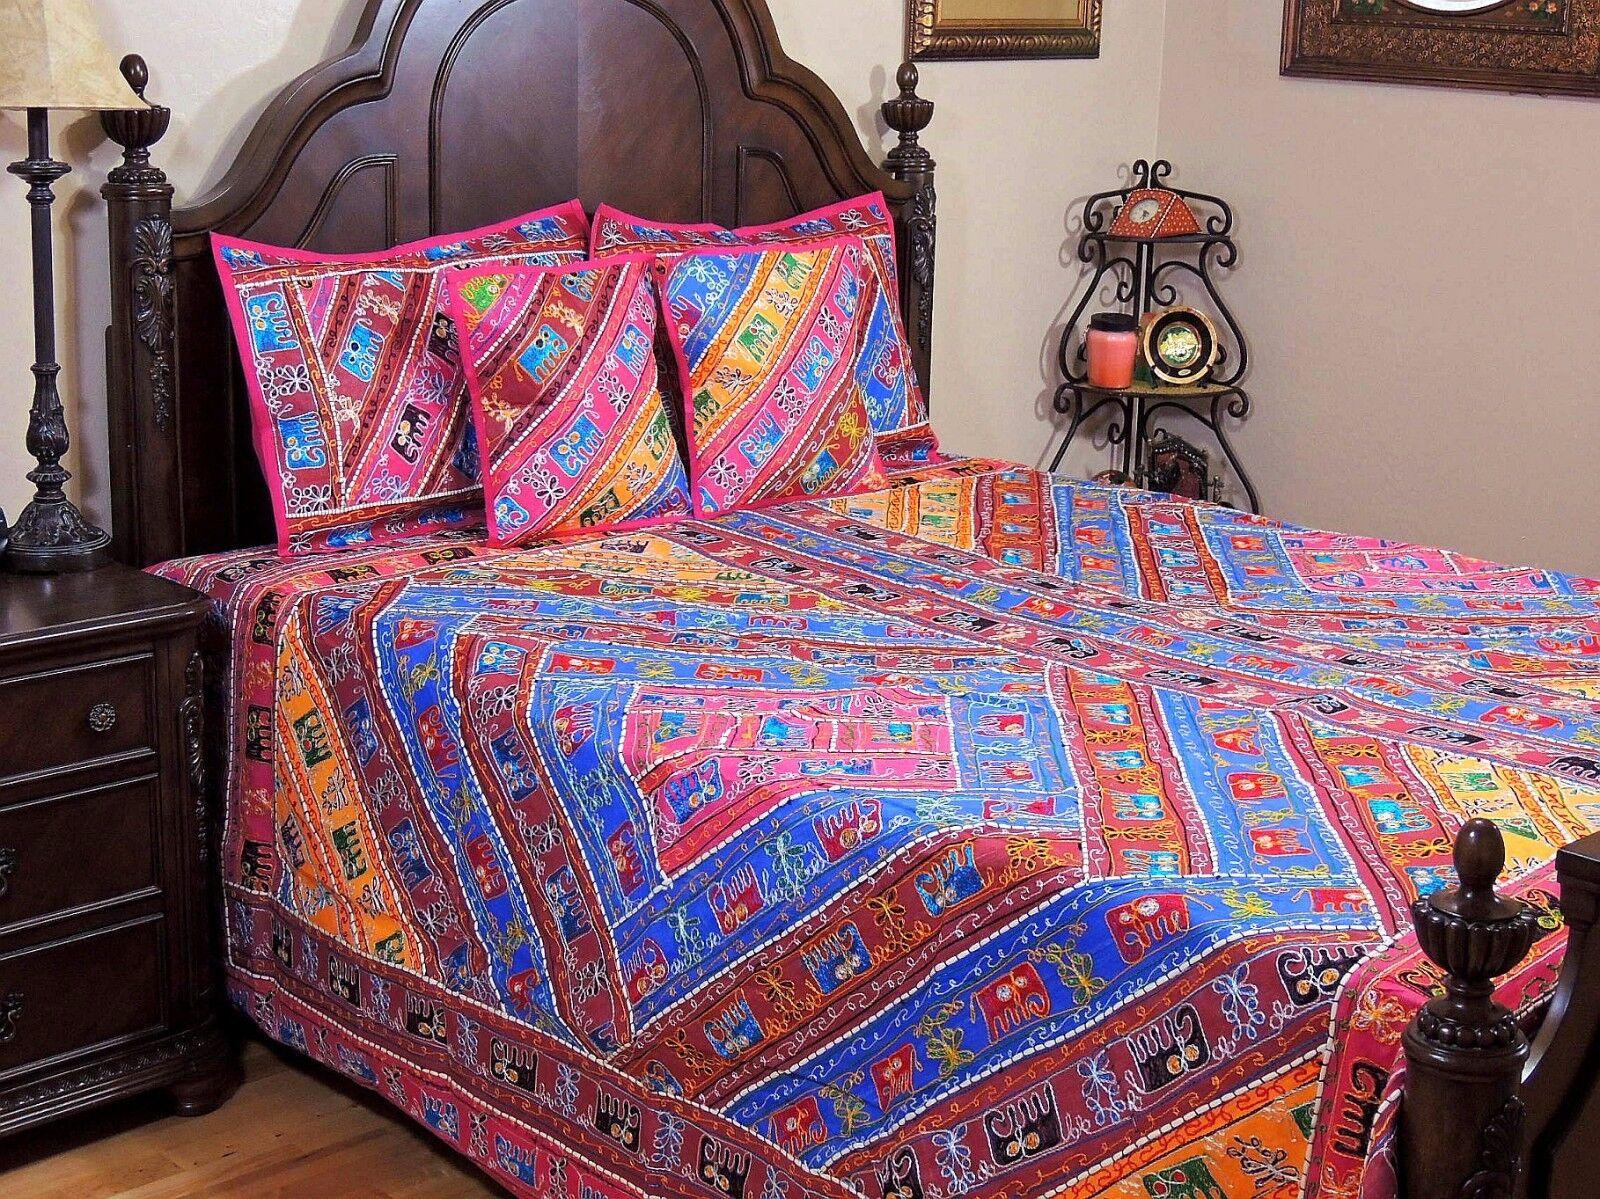 Aari Elephant Embroiderot MultiFarbe Duvet Ethnic Indian Sari Bedspread King